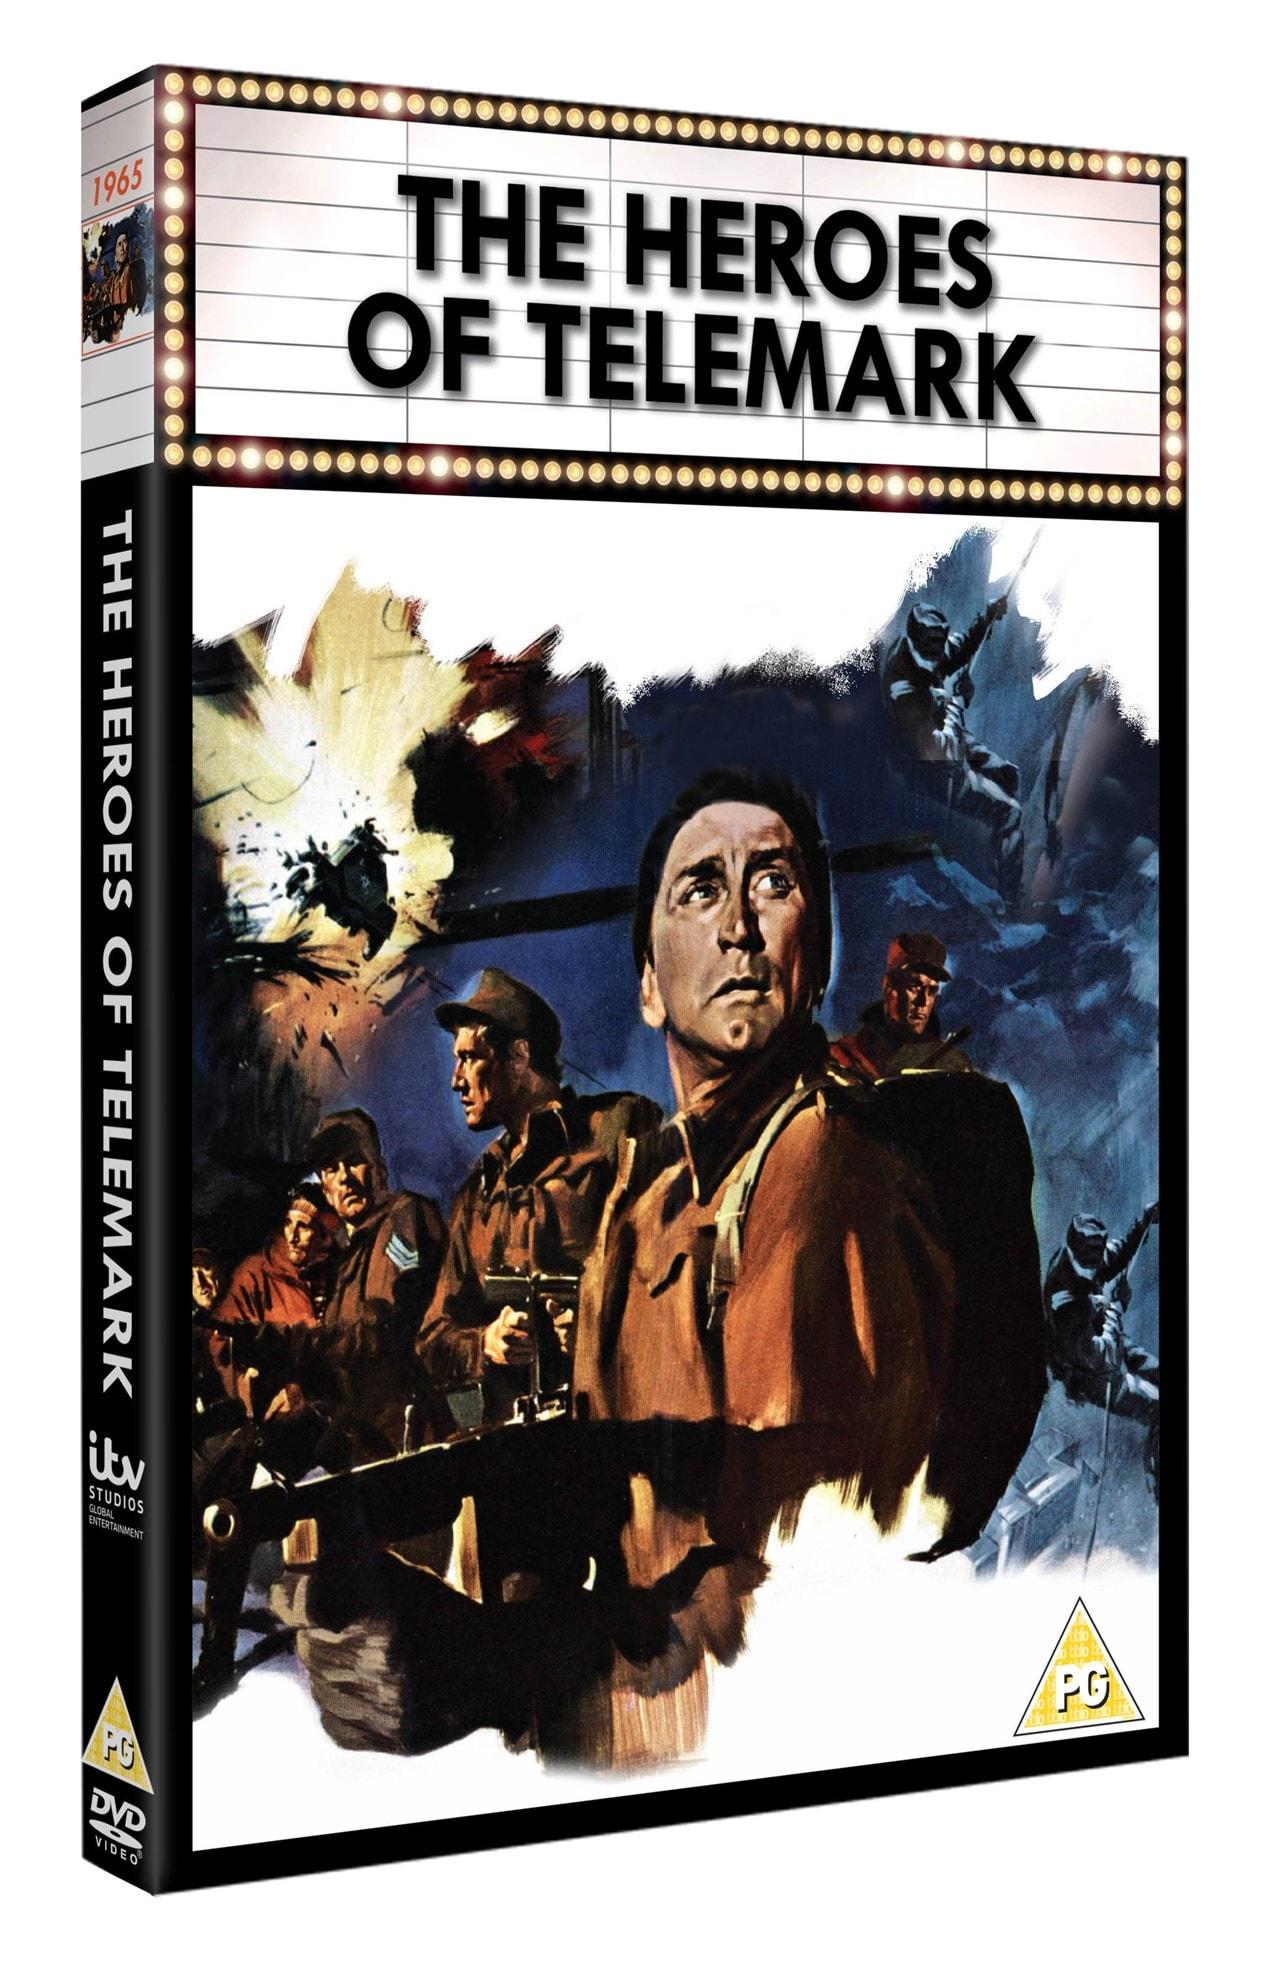 The Heroes of Telemark - British Classics (hmv Exclusive) - 2